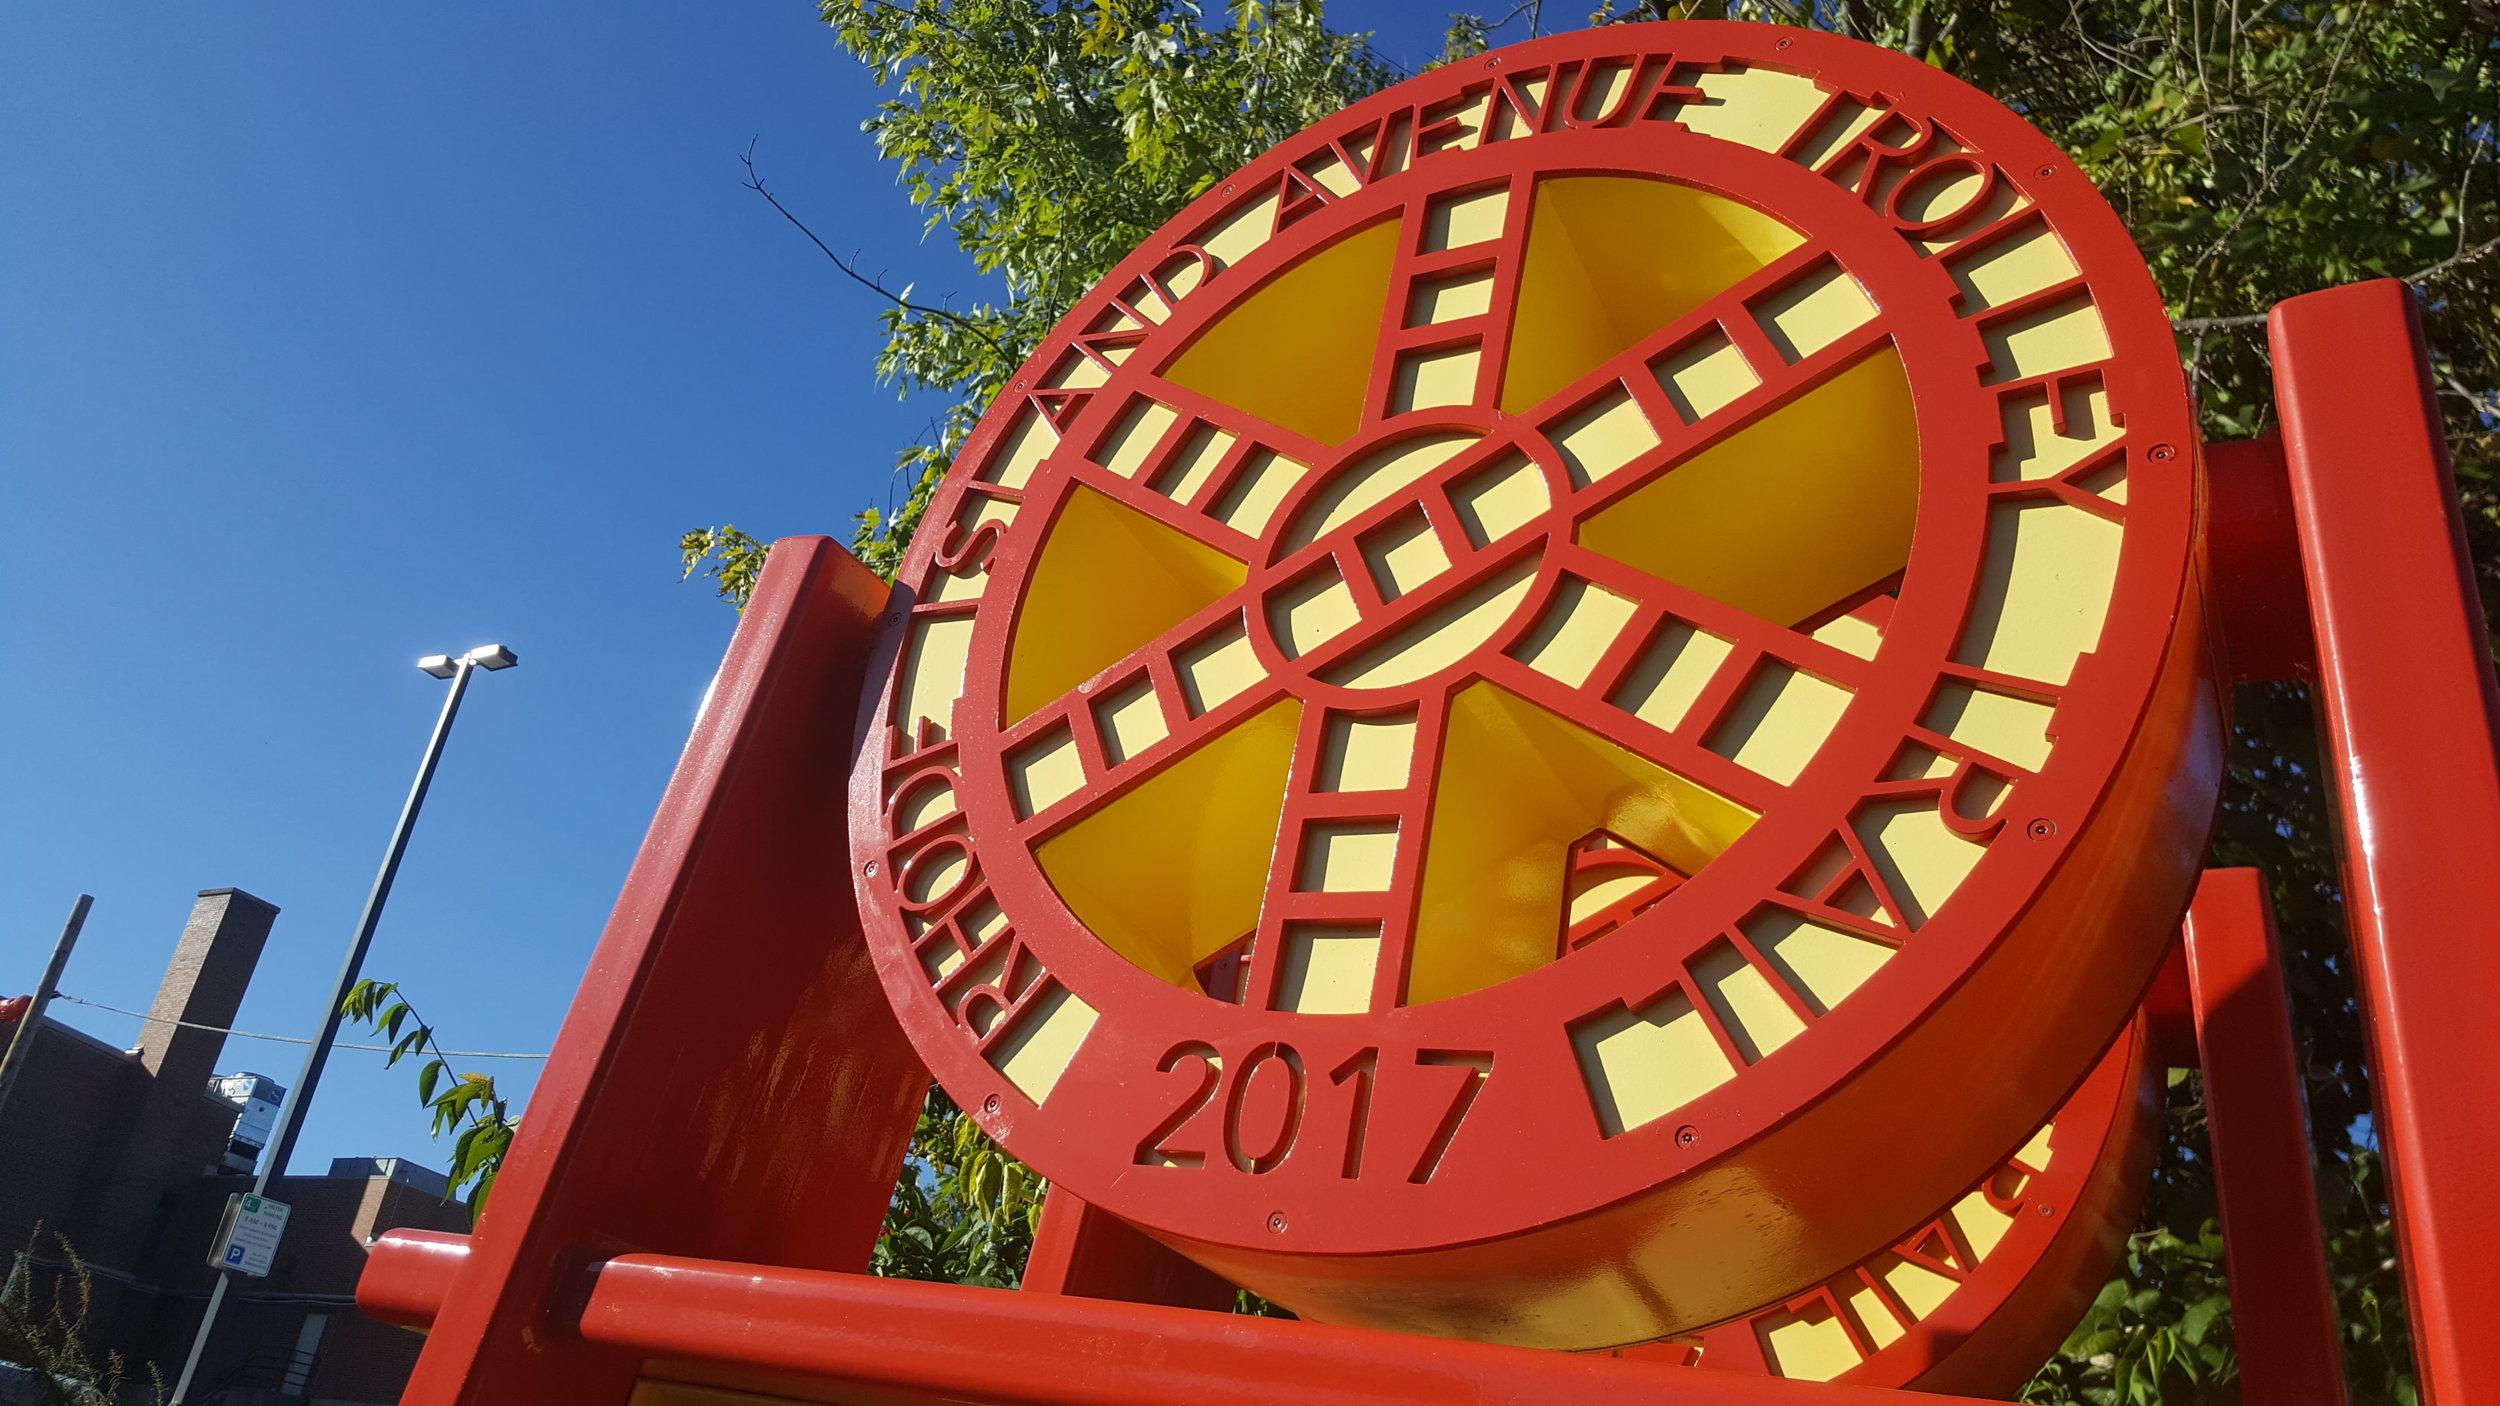 Rhode Island Trolley Trail Sculptural Signage